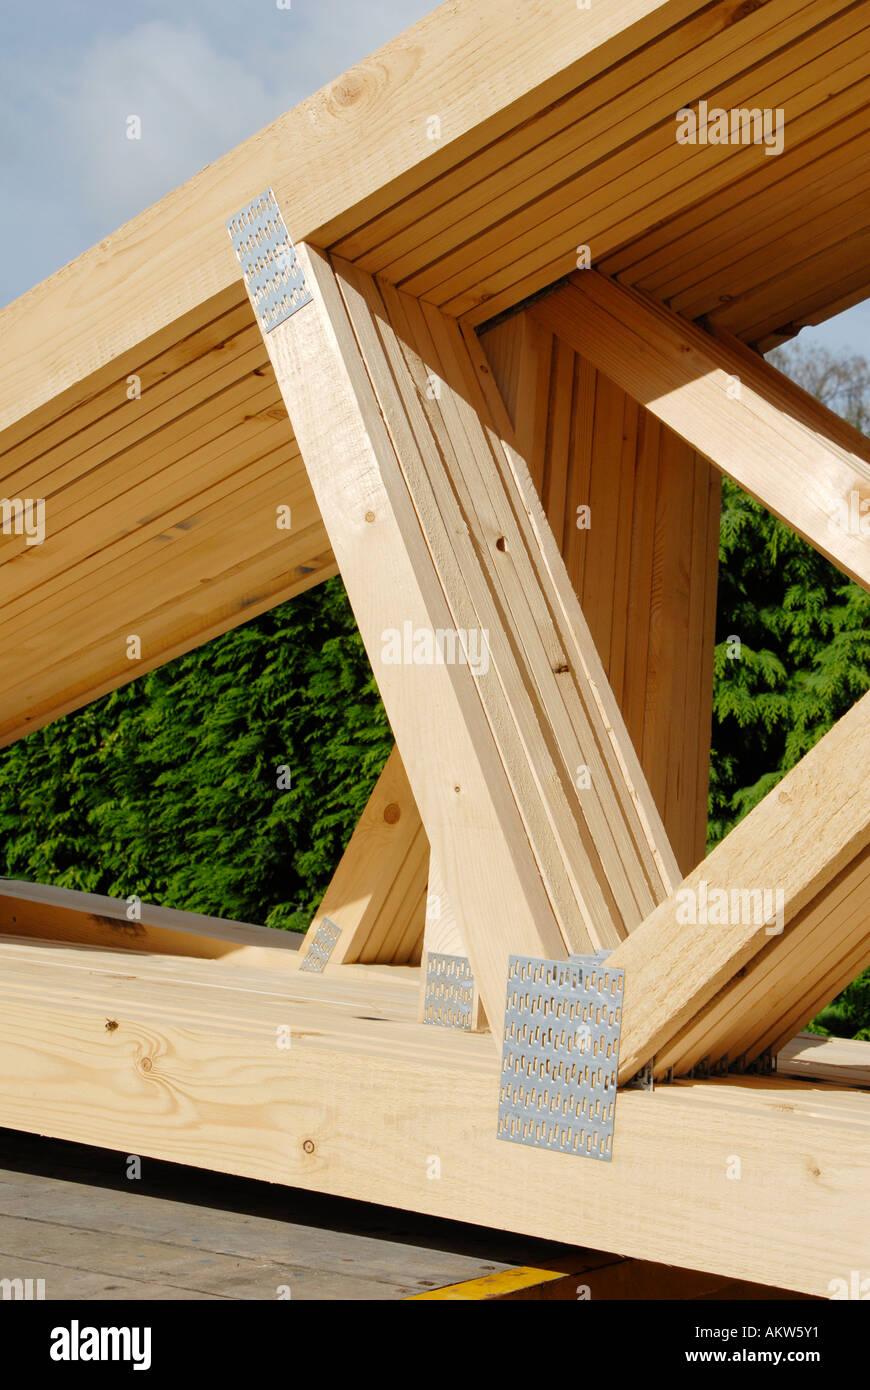 Vigas de techo de madera listos para usar en un sitio de construcción. Inglaterra, Reino Unido. Imagen De Stock